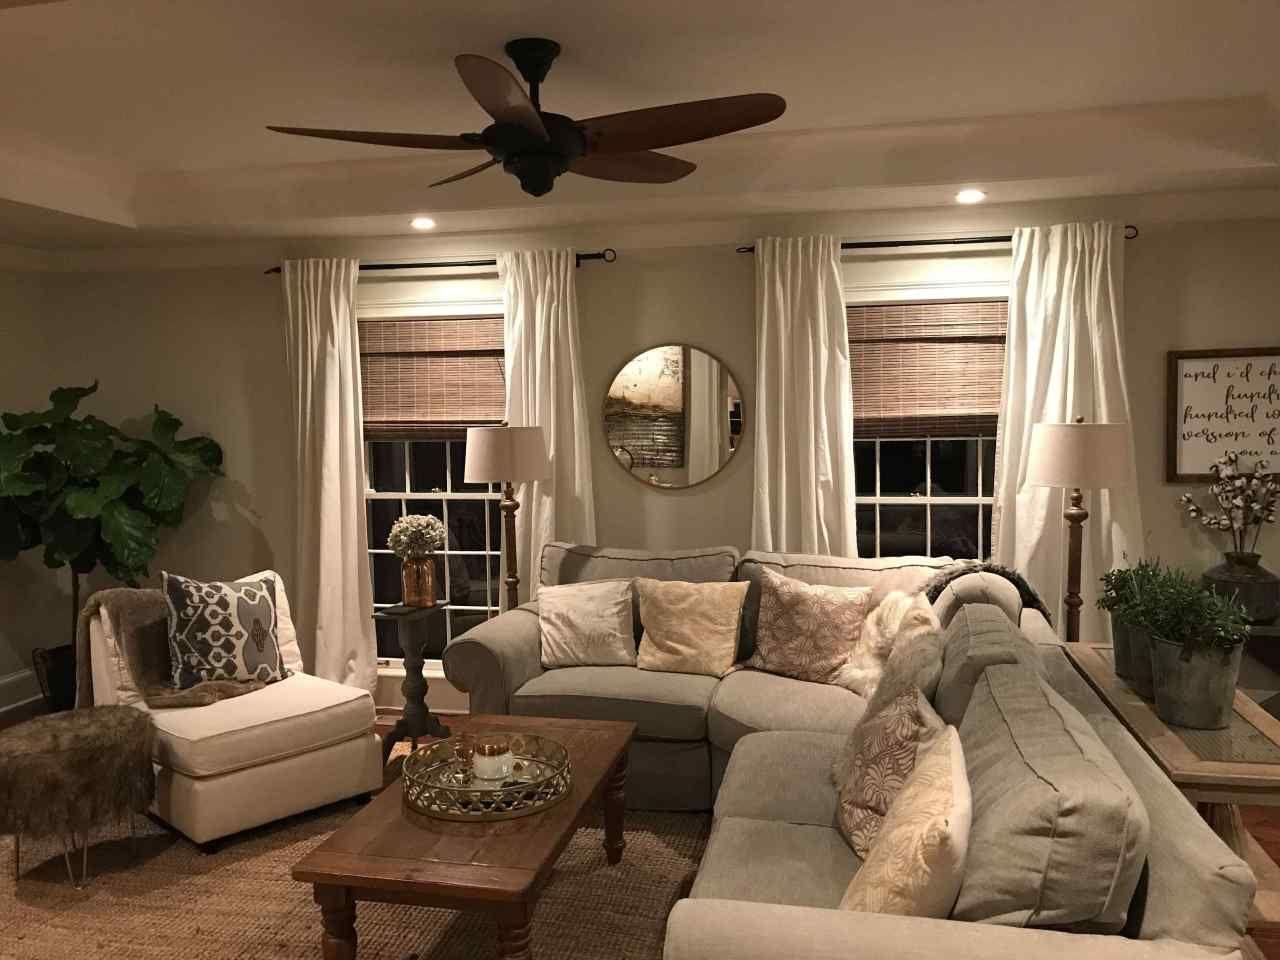 Rustic Home Decor Living Room Farmhouse Style Joanna Gaines Fresh 30 Best Farmhouse Style Ideas Rustic Home Decor images